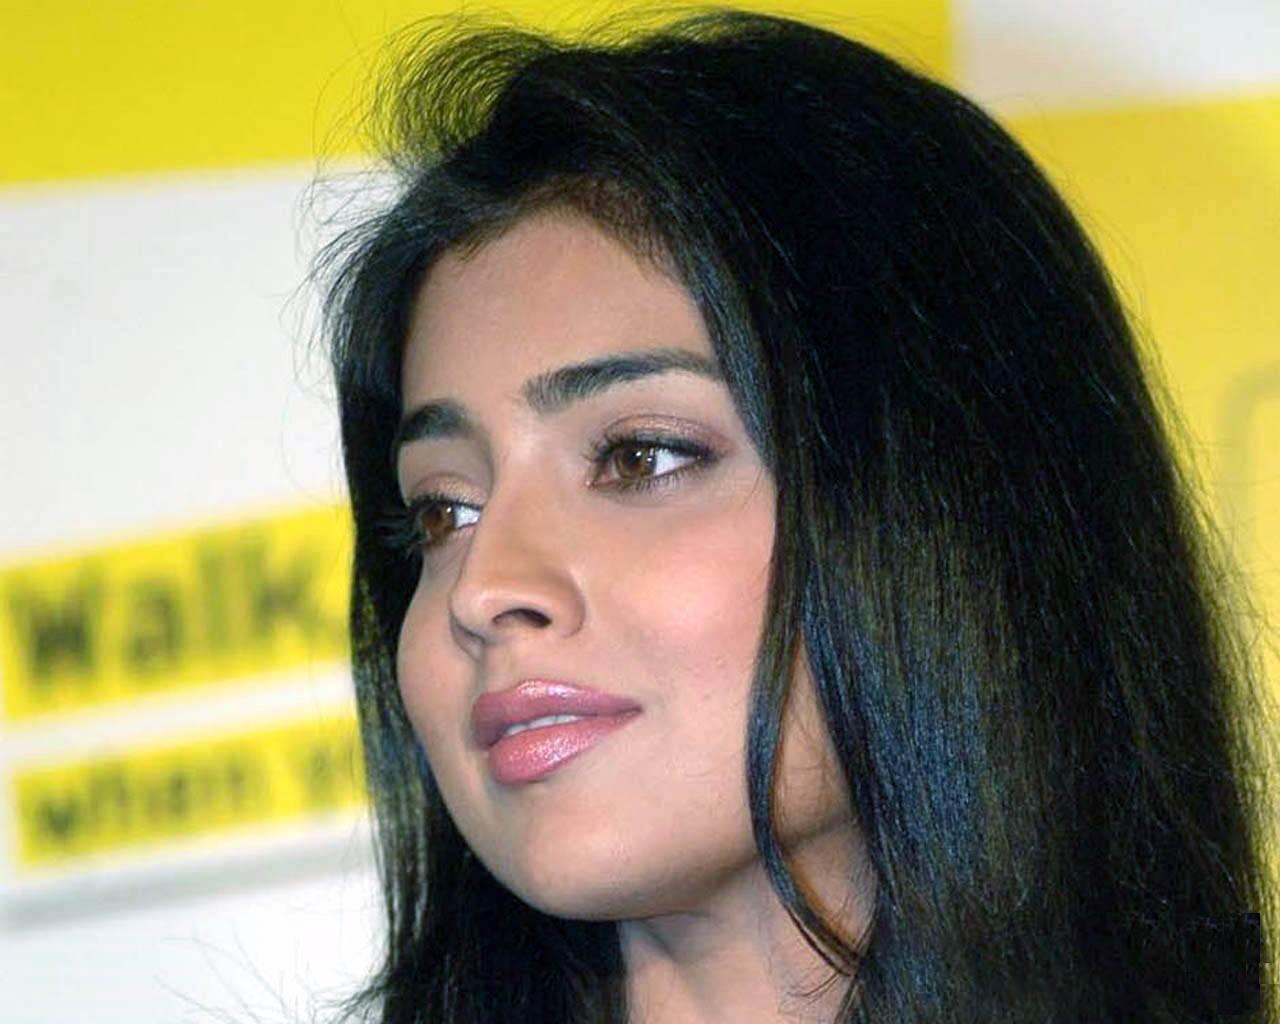 http://2.bp.blogspot.com/-JakZ4GnAJWs/TXDgNHVfUvI/AAAAAAAADzI/rq7WF0dKNyk/s1600/ShriyaSaran.jpg